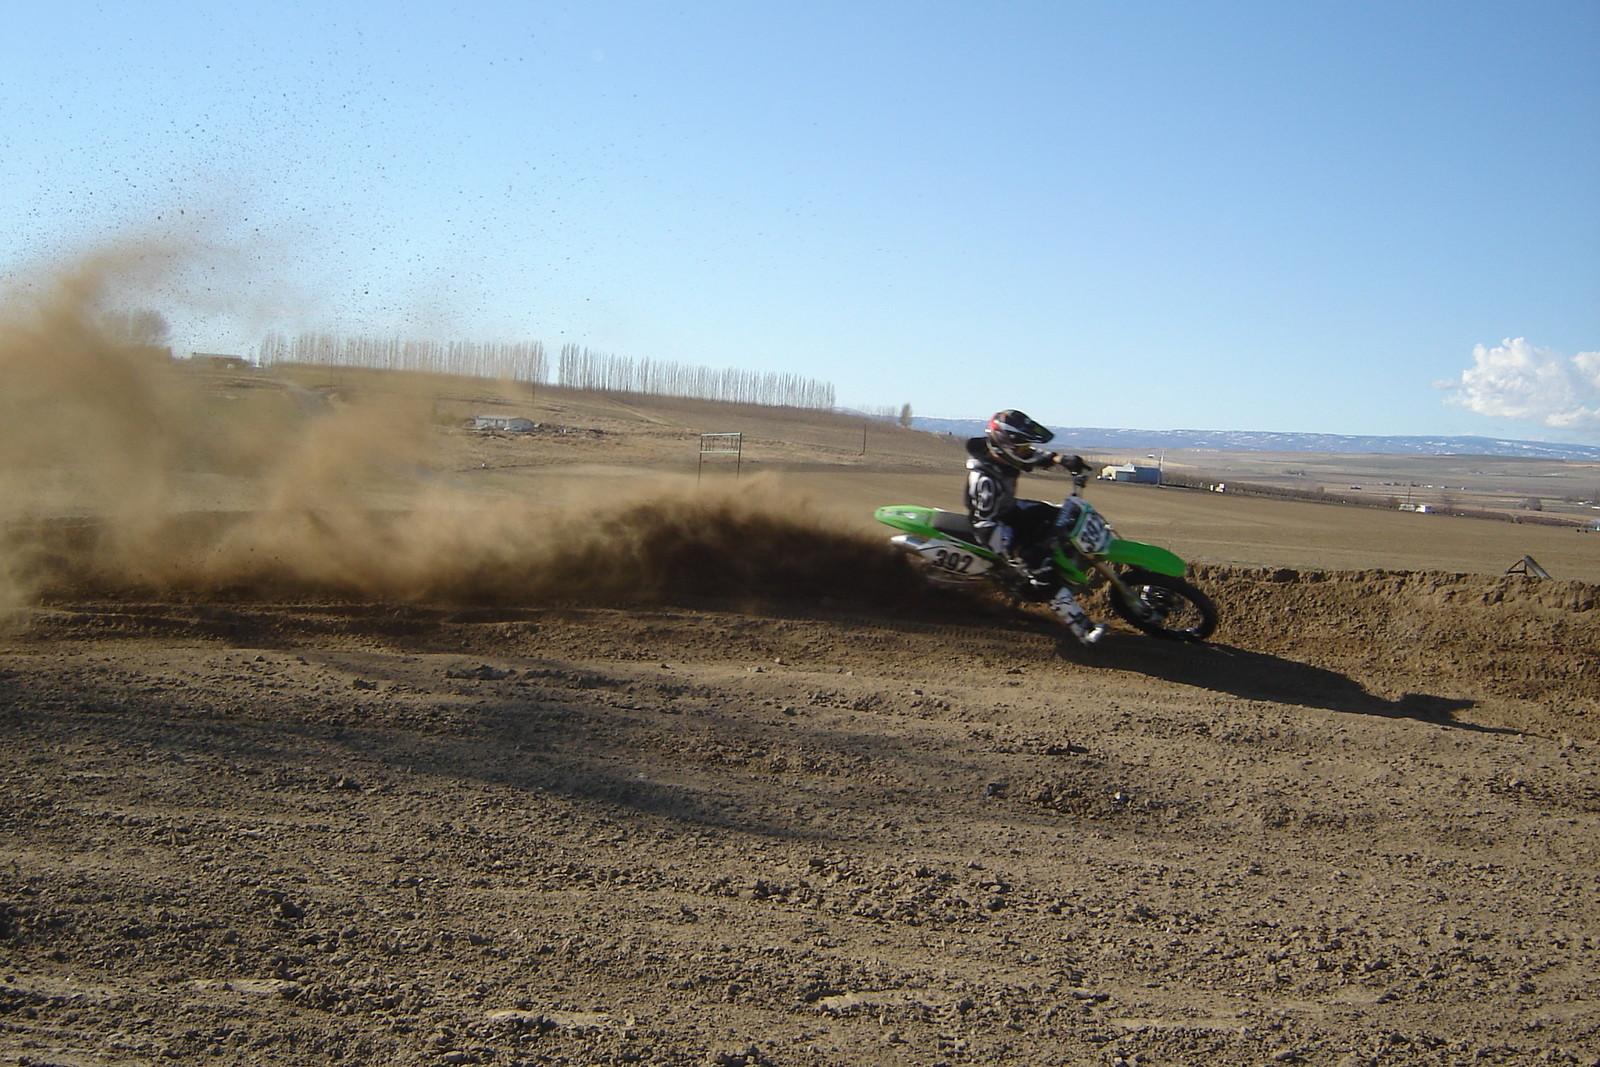 Toes MX Park - mxaaron - Motocross Pictures - Vital MX